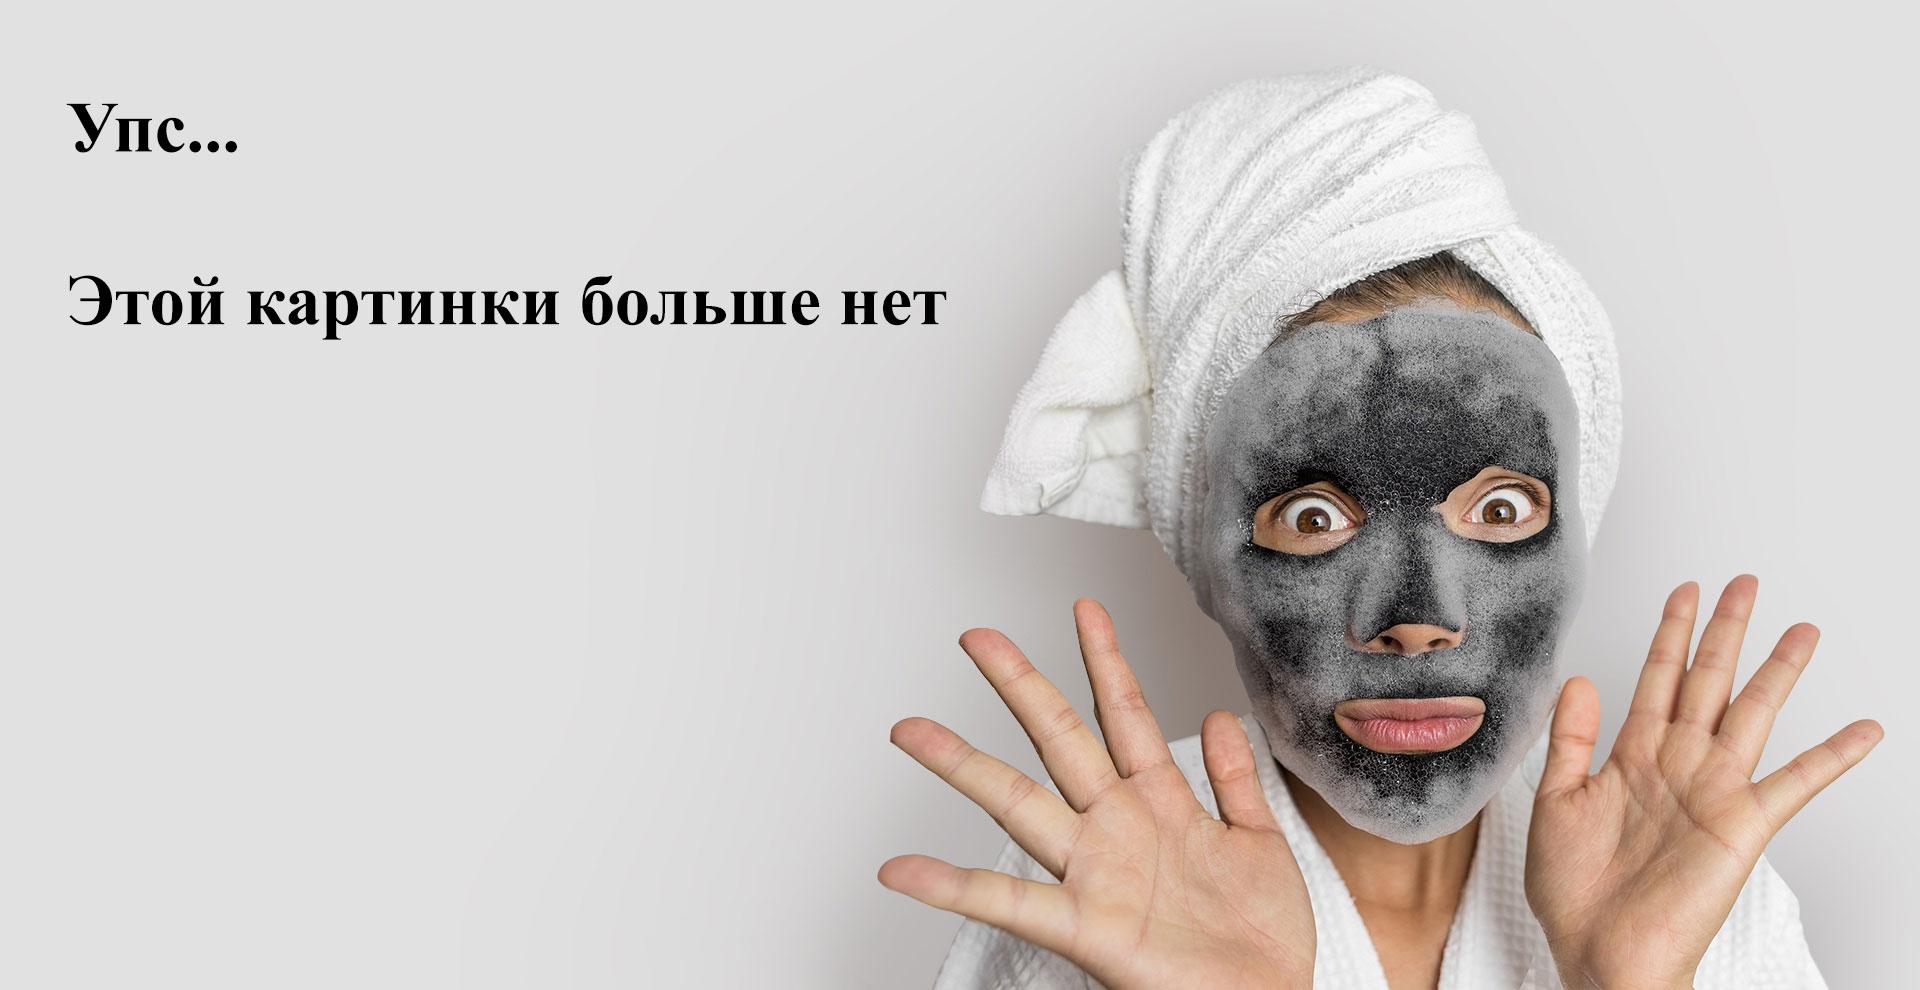 OLLIN, Сыворотка BioNika «Баланс от корней до кончиков», 10х15 мл